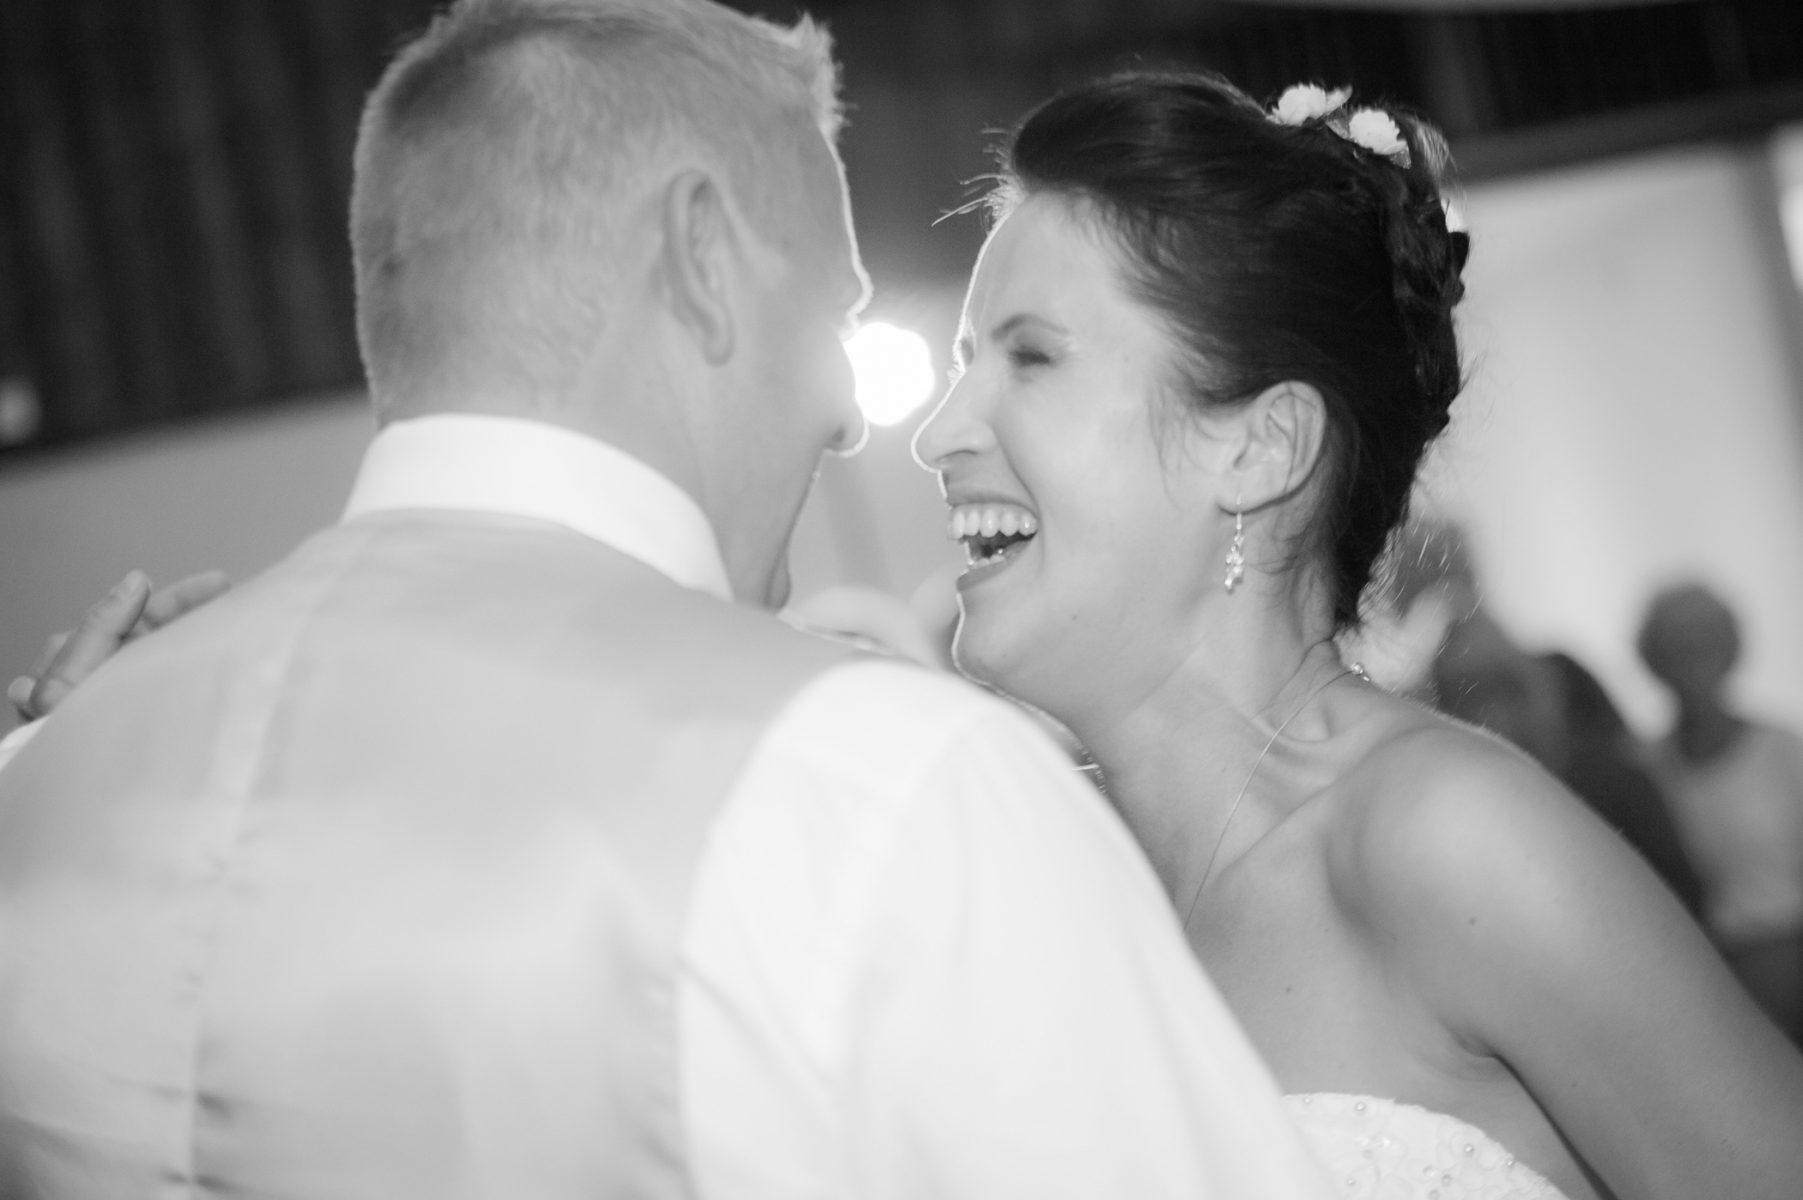 Hochzeit Paarfotos M PE2018 8898 1803x1200 - GRATULATION & EMOTION